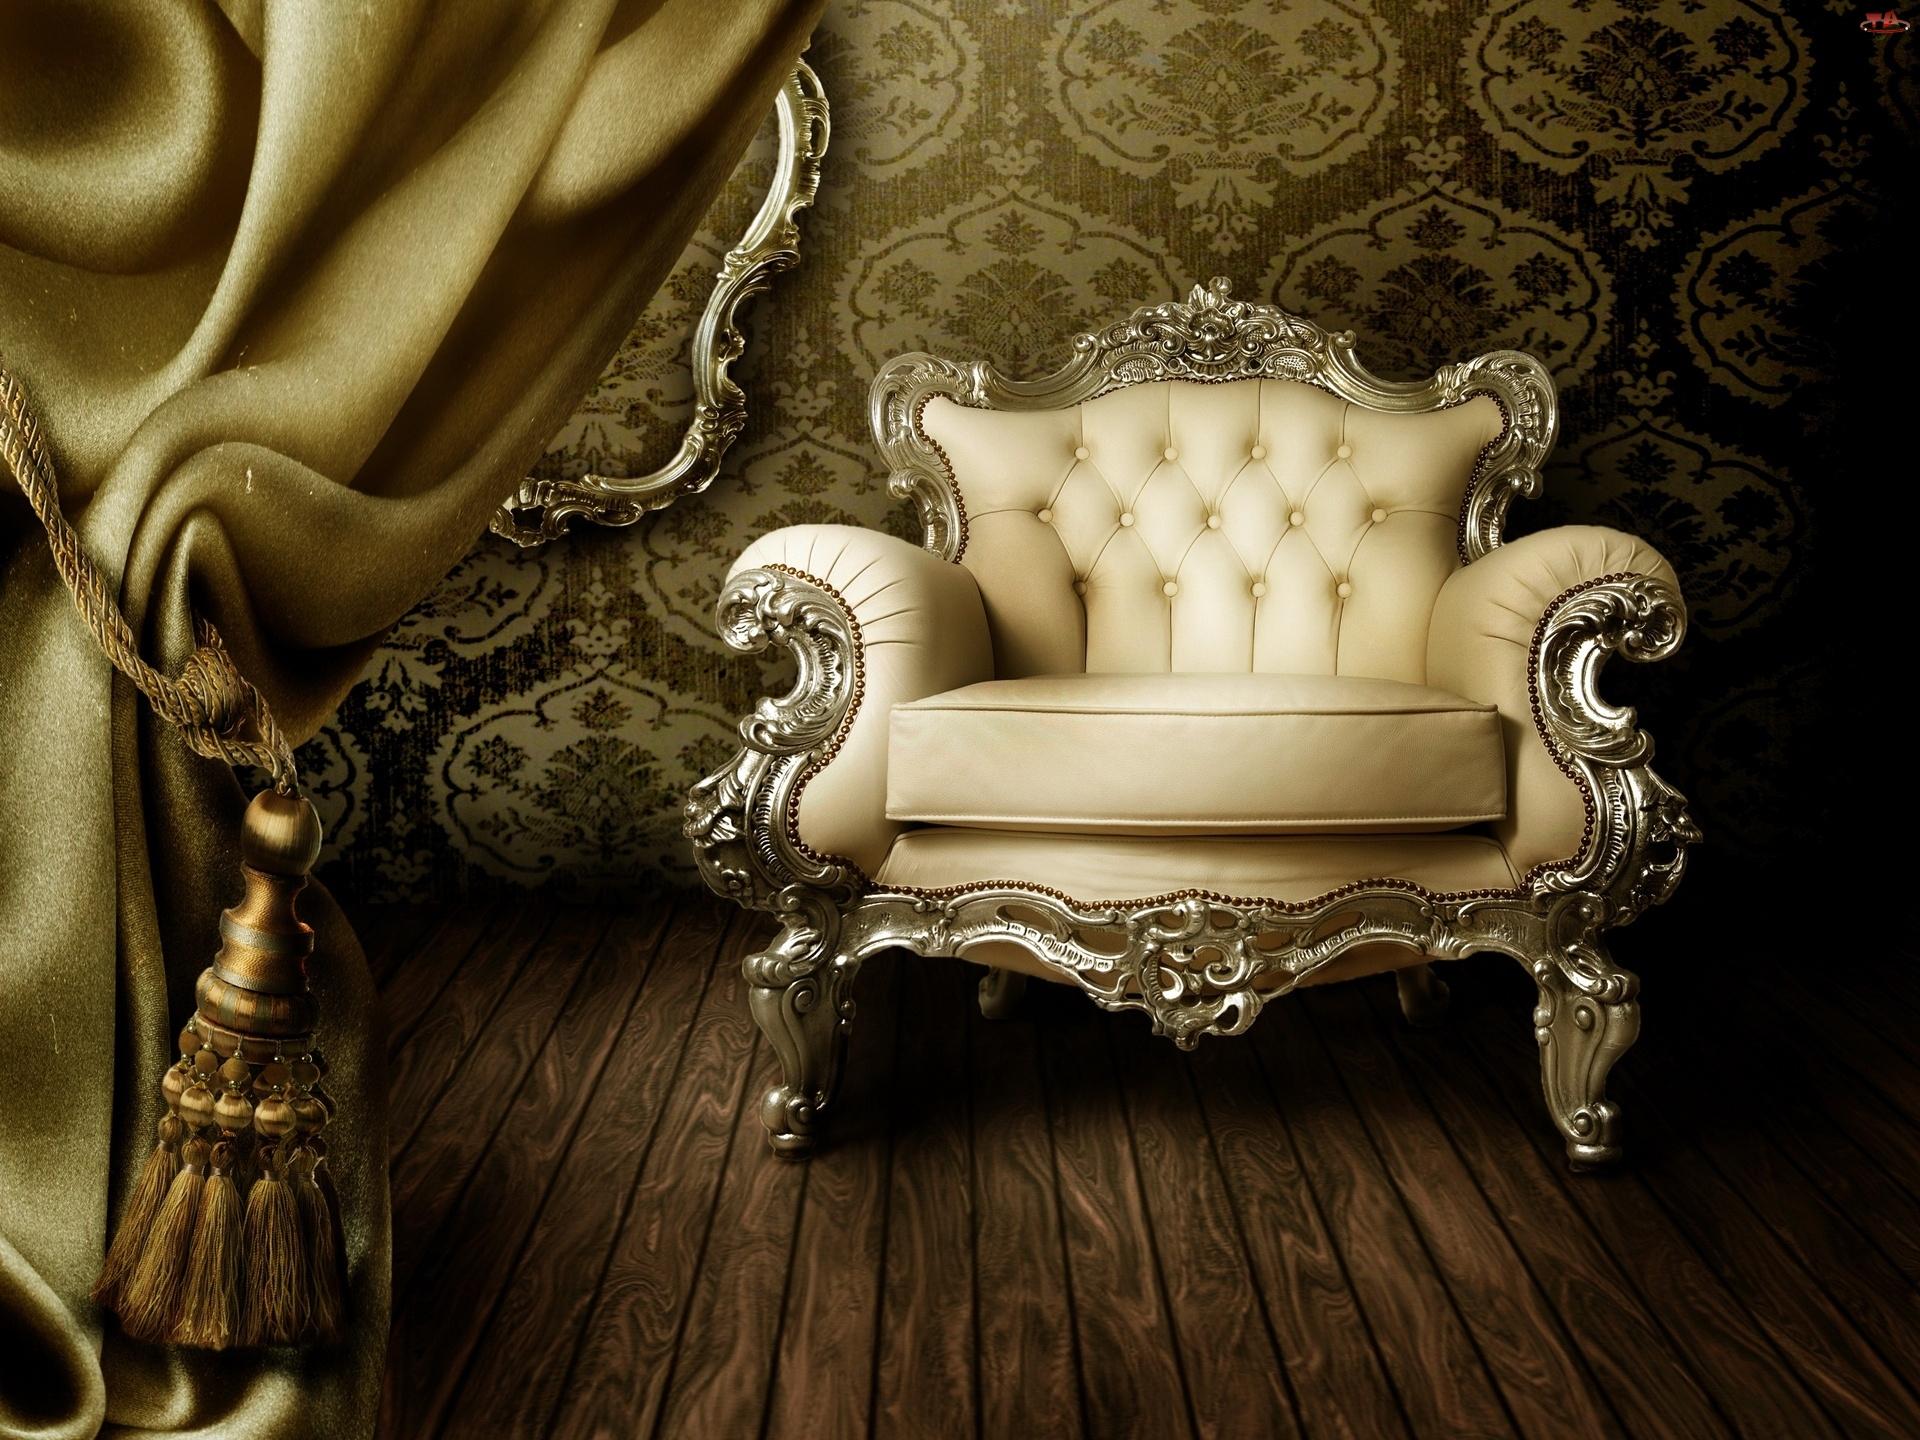 Pokój, Kotara, Stylowy, Fotel